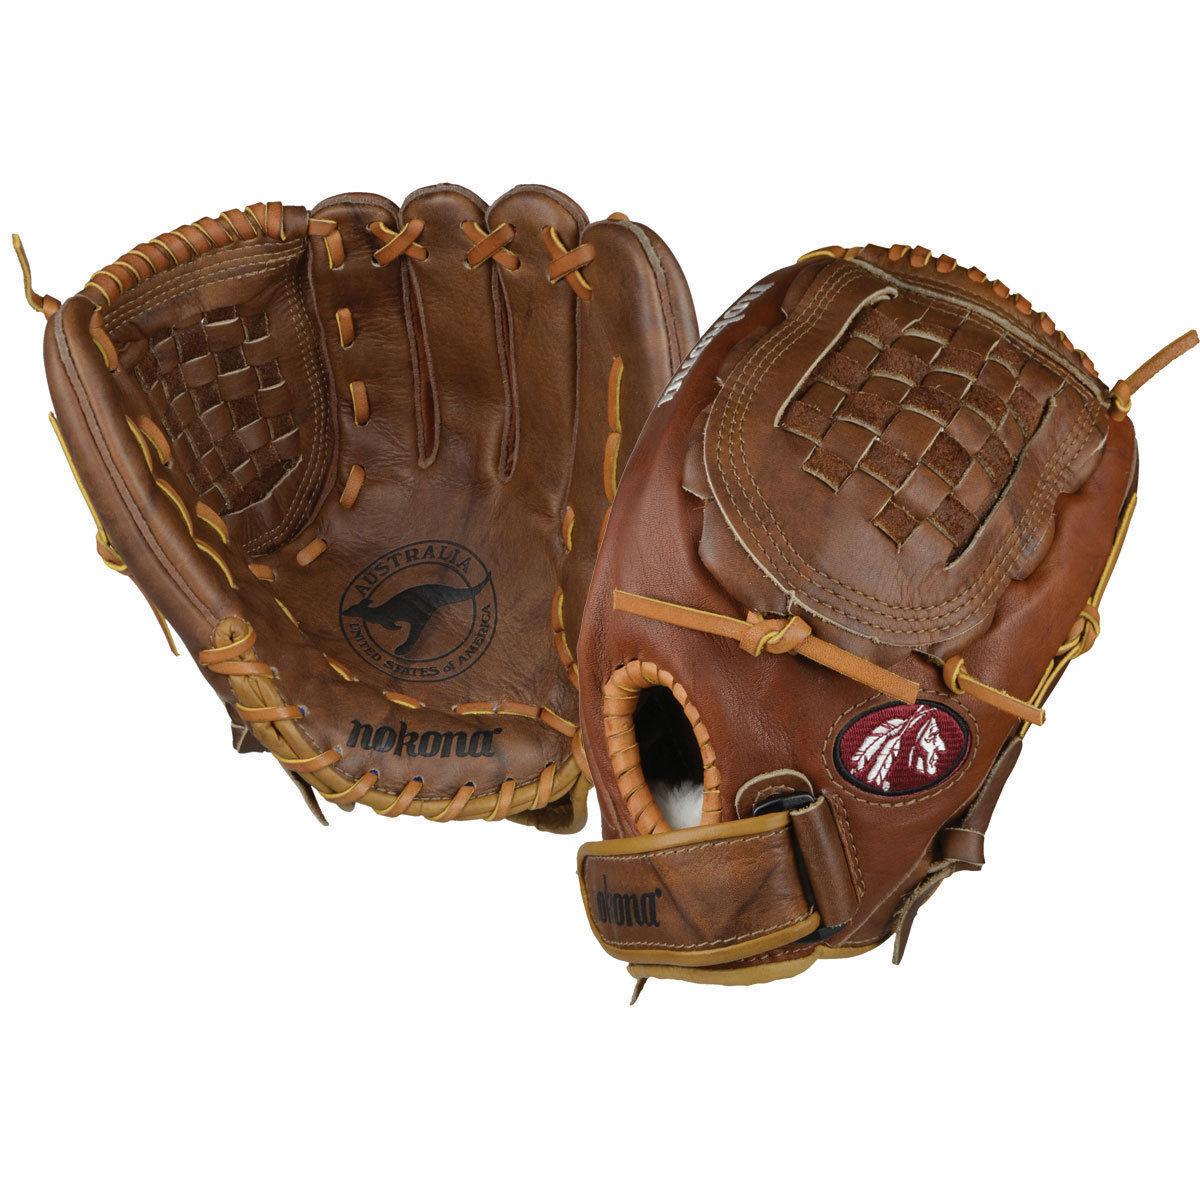 Mens outfield gloves - Nokona Buckaroo Series The Nokona Buckaroo Series Outfield Glove